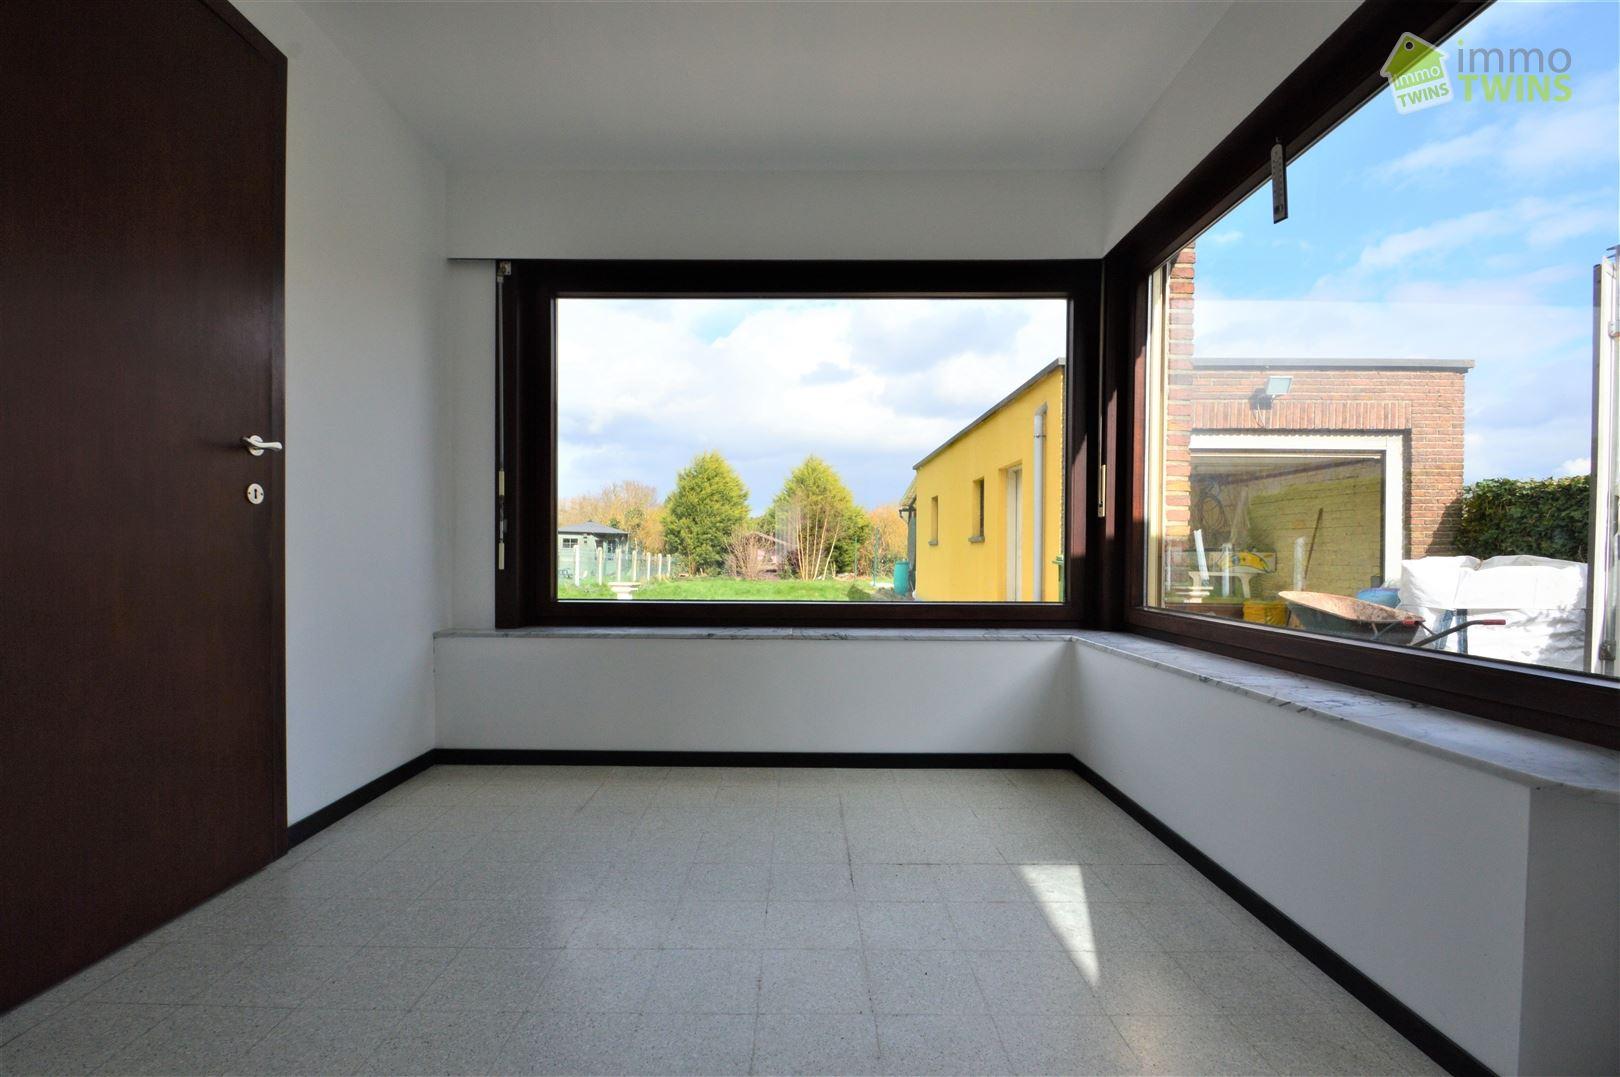 Foto 4 : Woning te 9280 LEBBEKE (België) - Prijs € 800